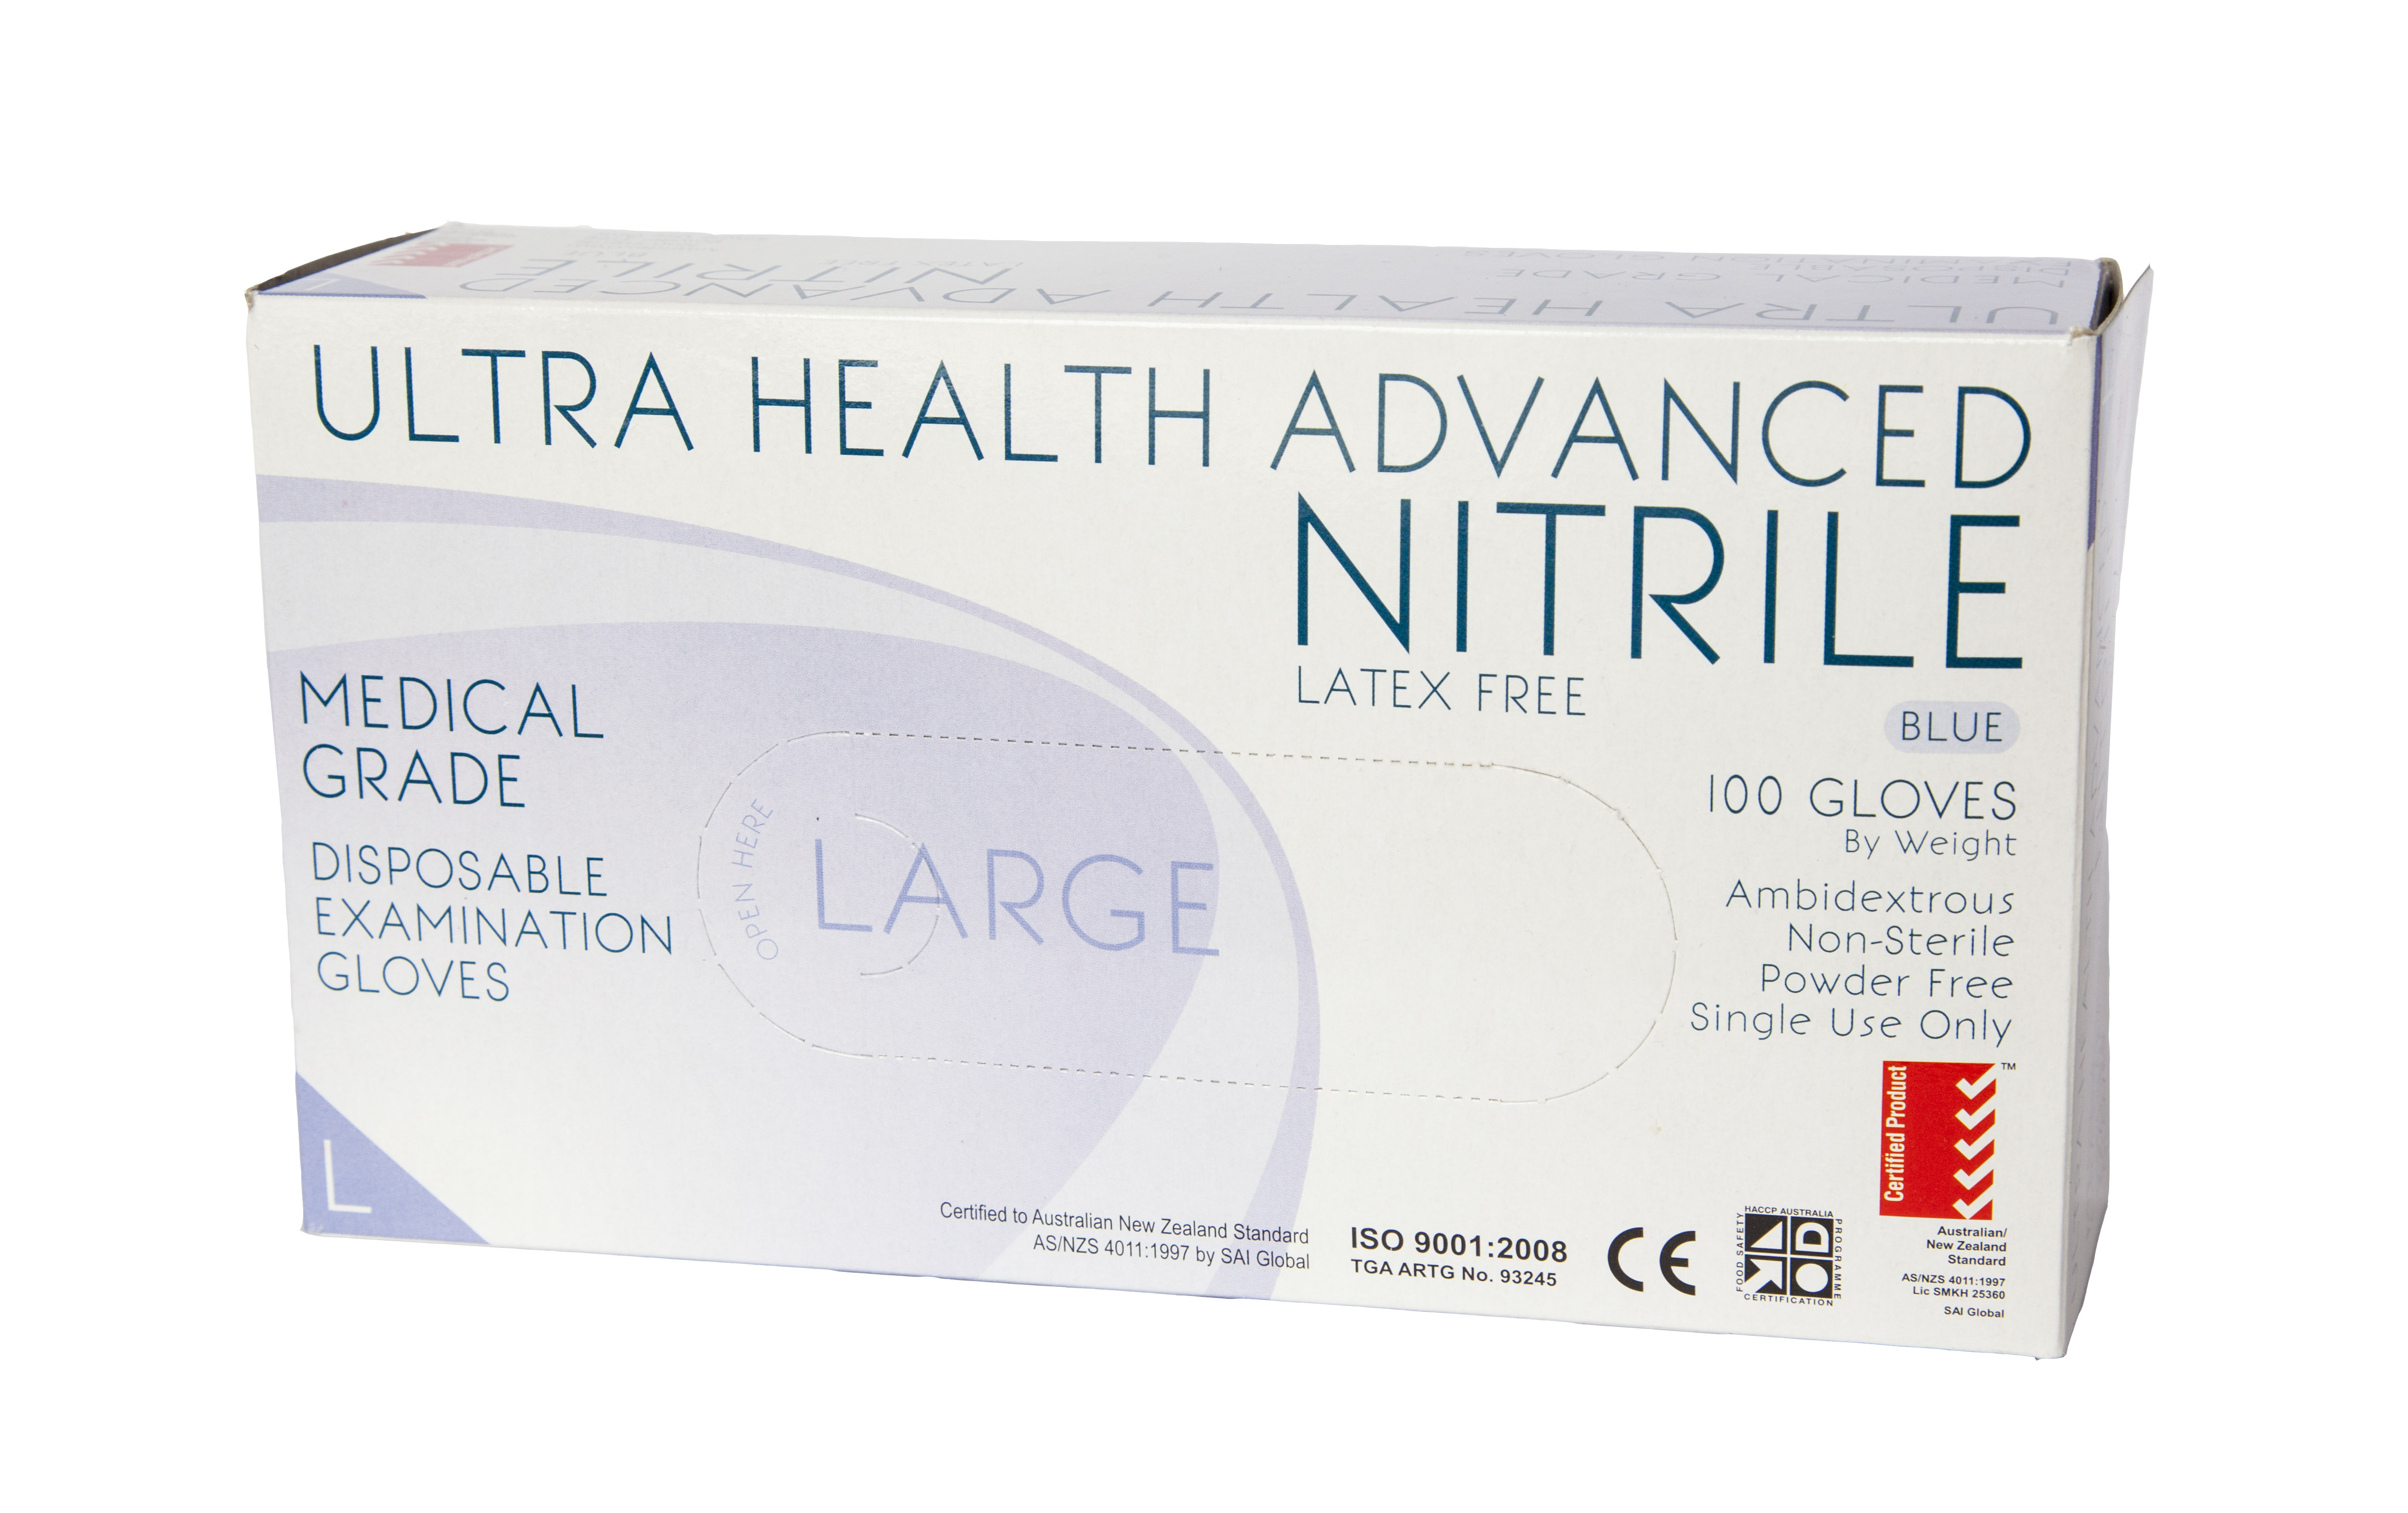 GLOVES ULTRA HEALTH ADVANCED NITRILE LARGE POWDERFREE NON STERILE